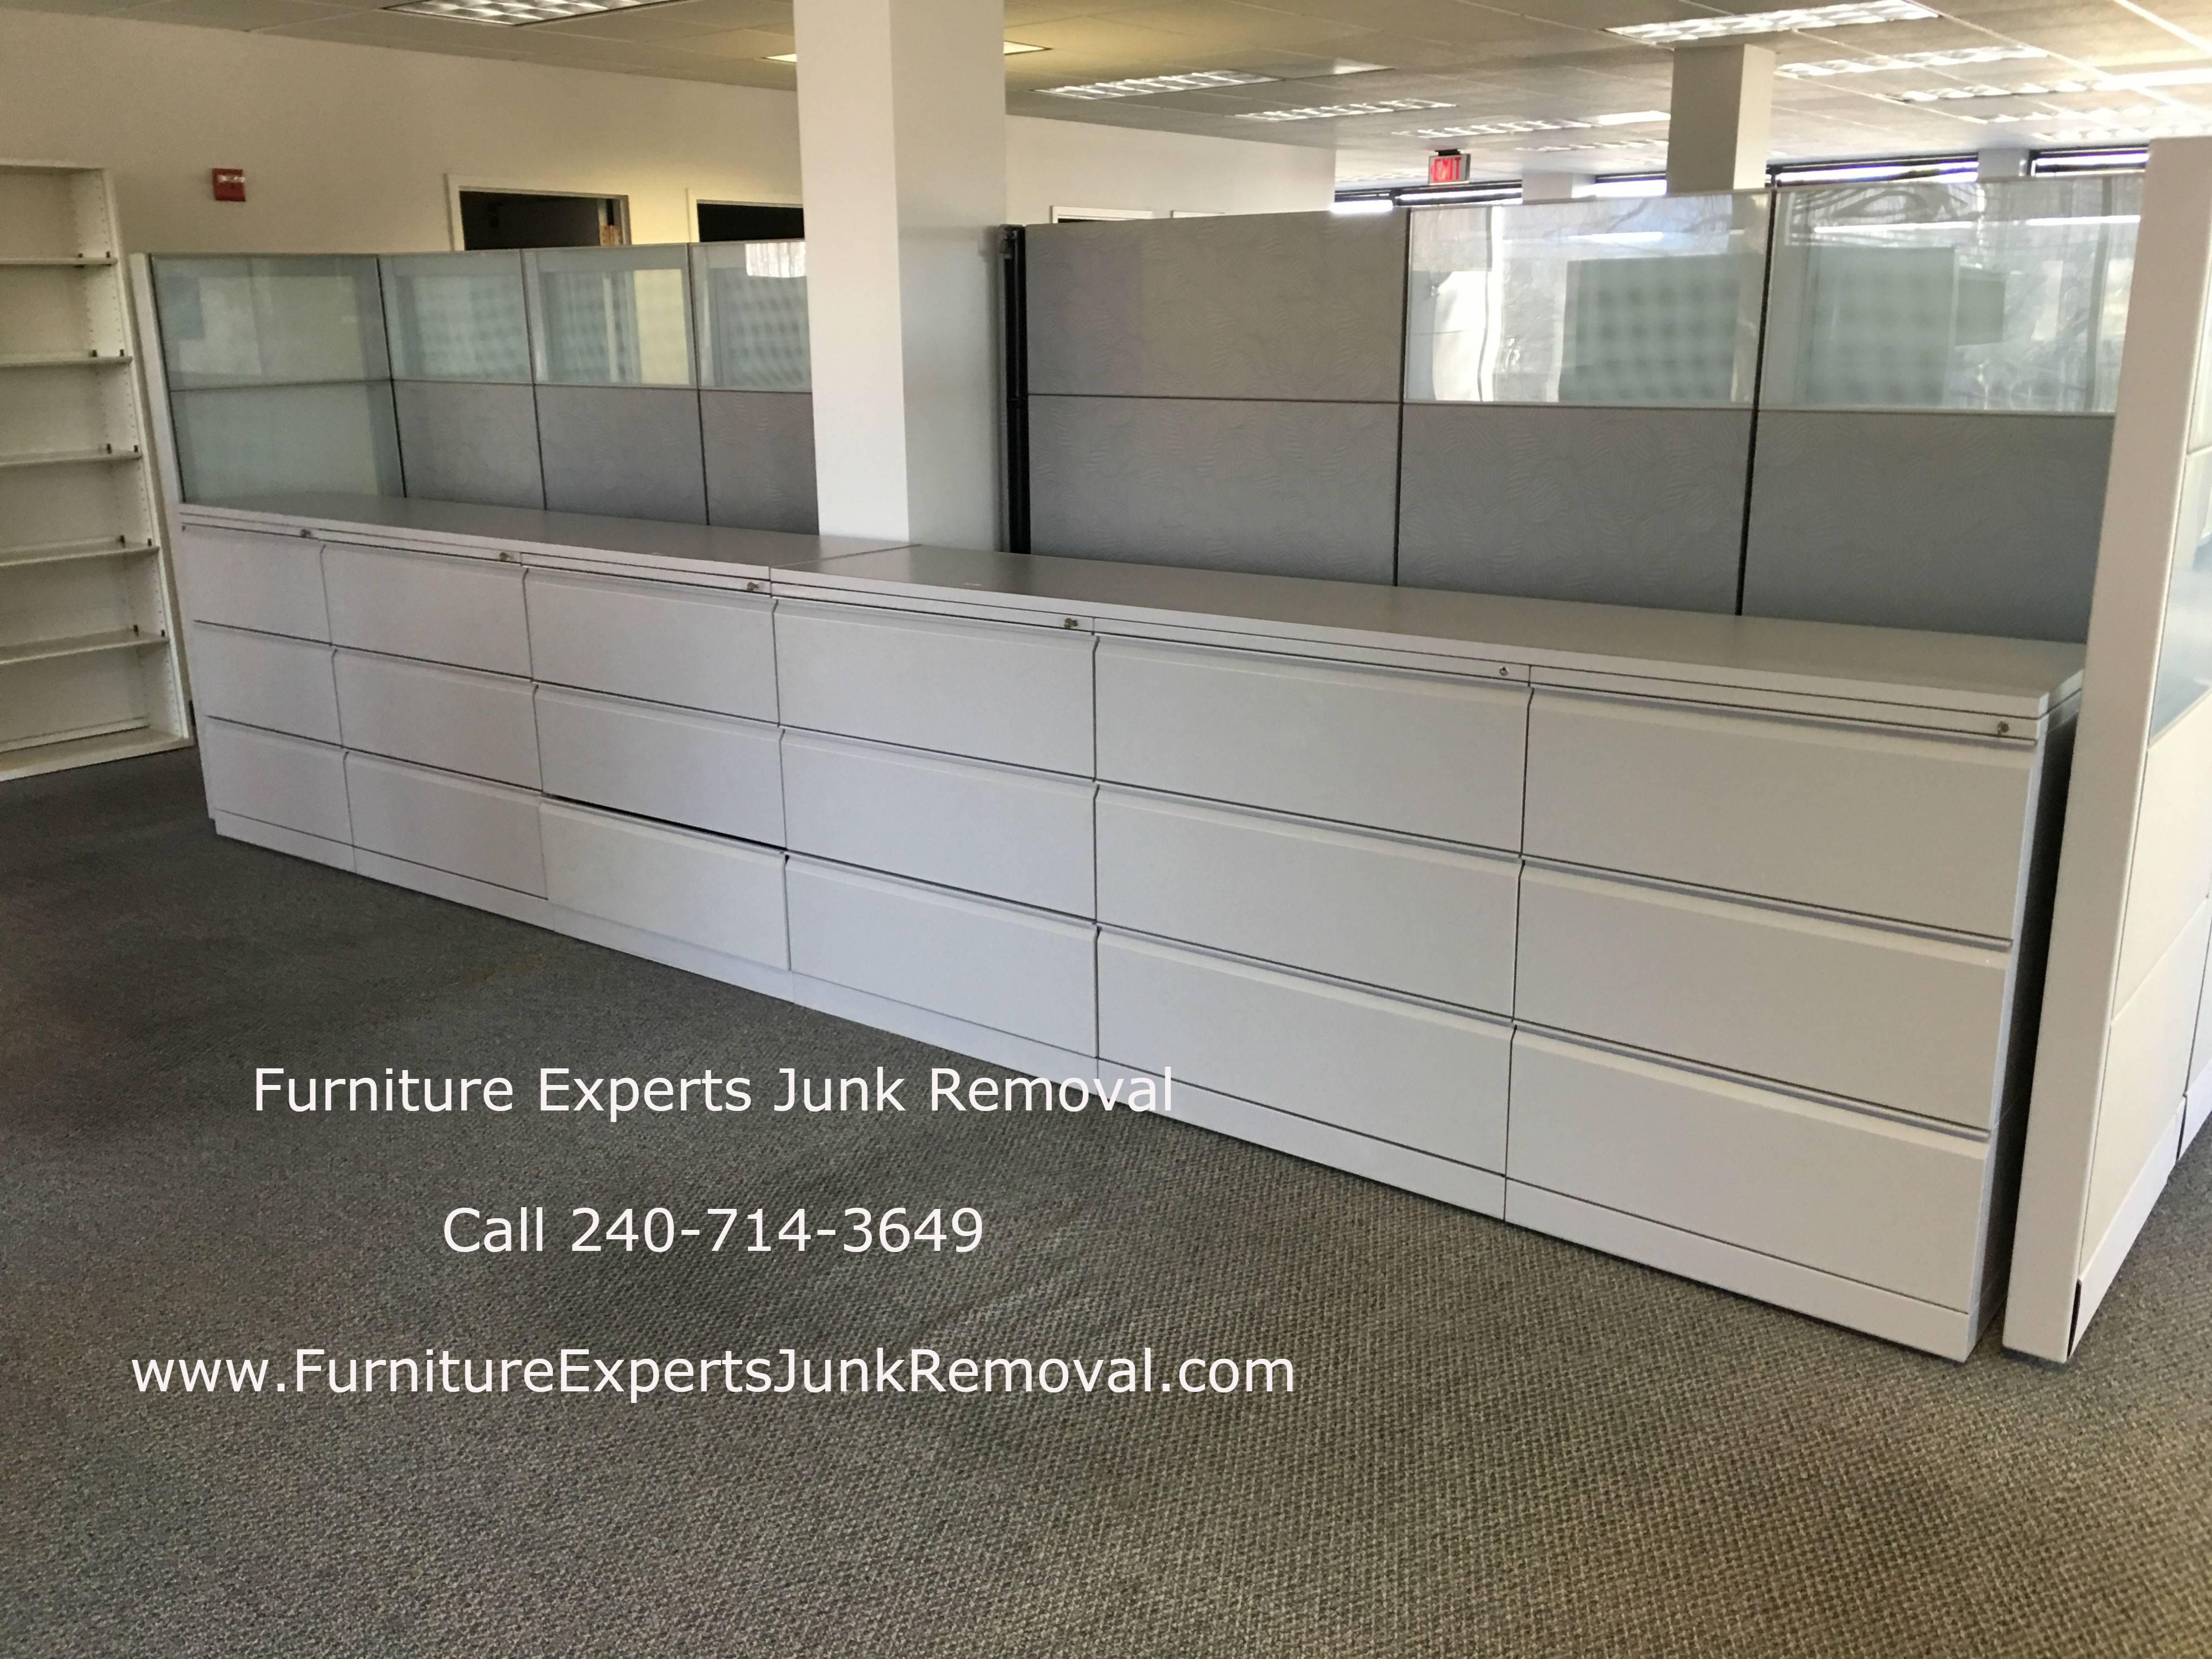 Junk office furniture removal in tysons corner VA